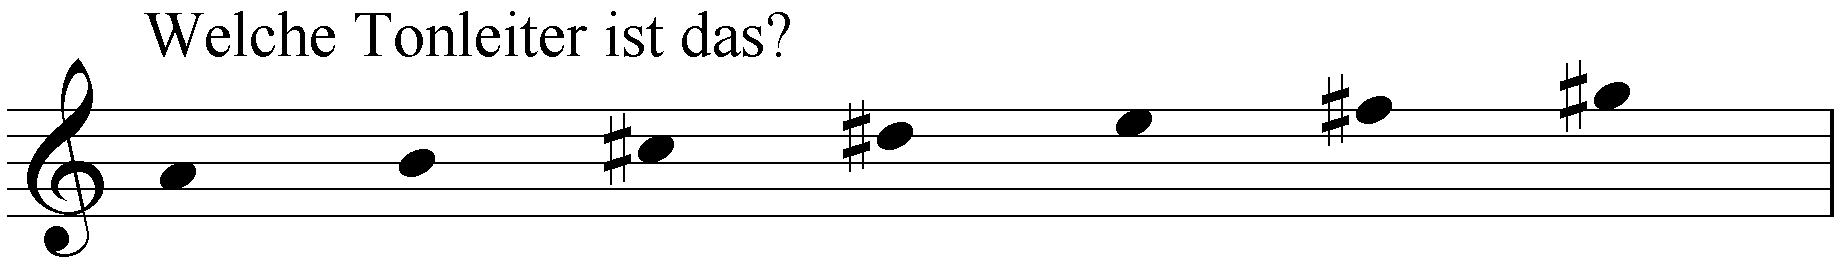 Welche Tonleiter ist das: a h cis dis e fis gis?